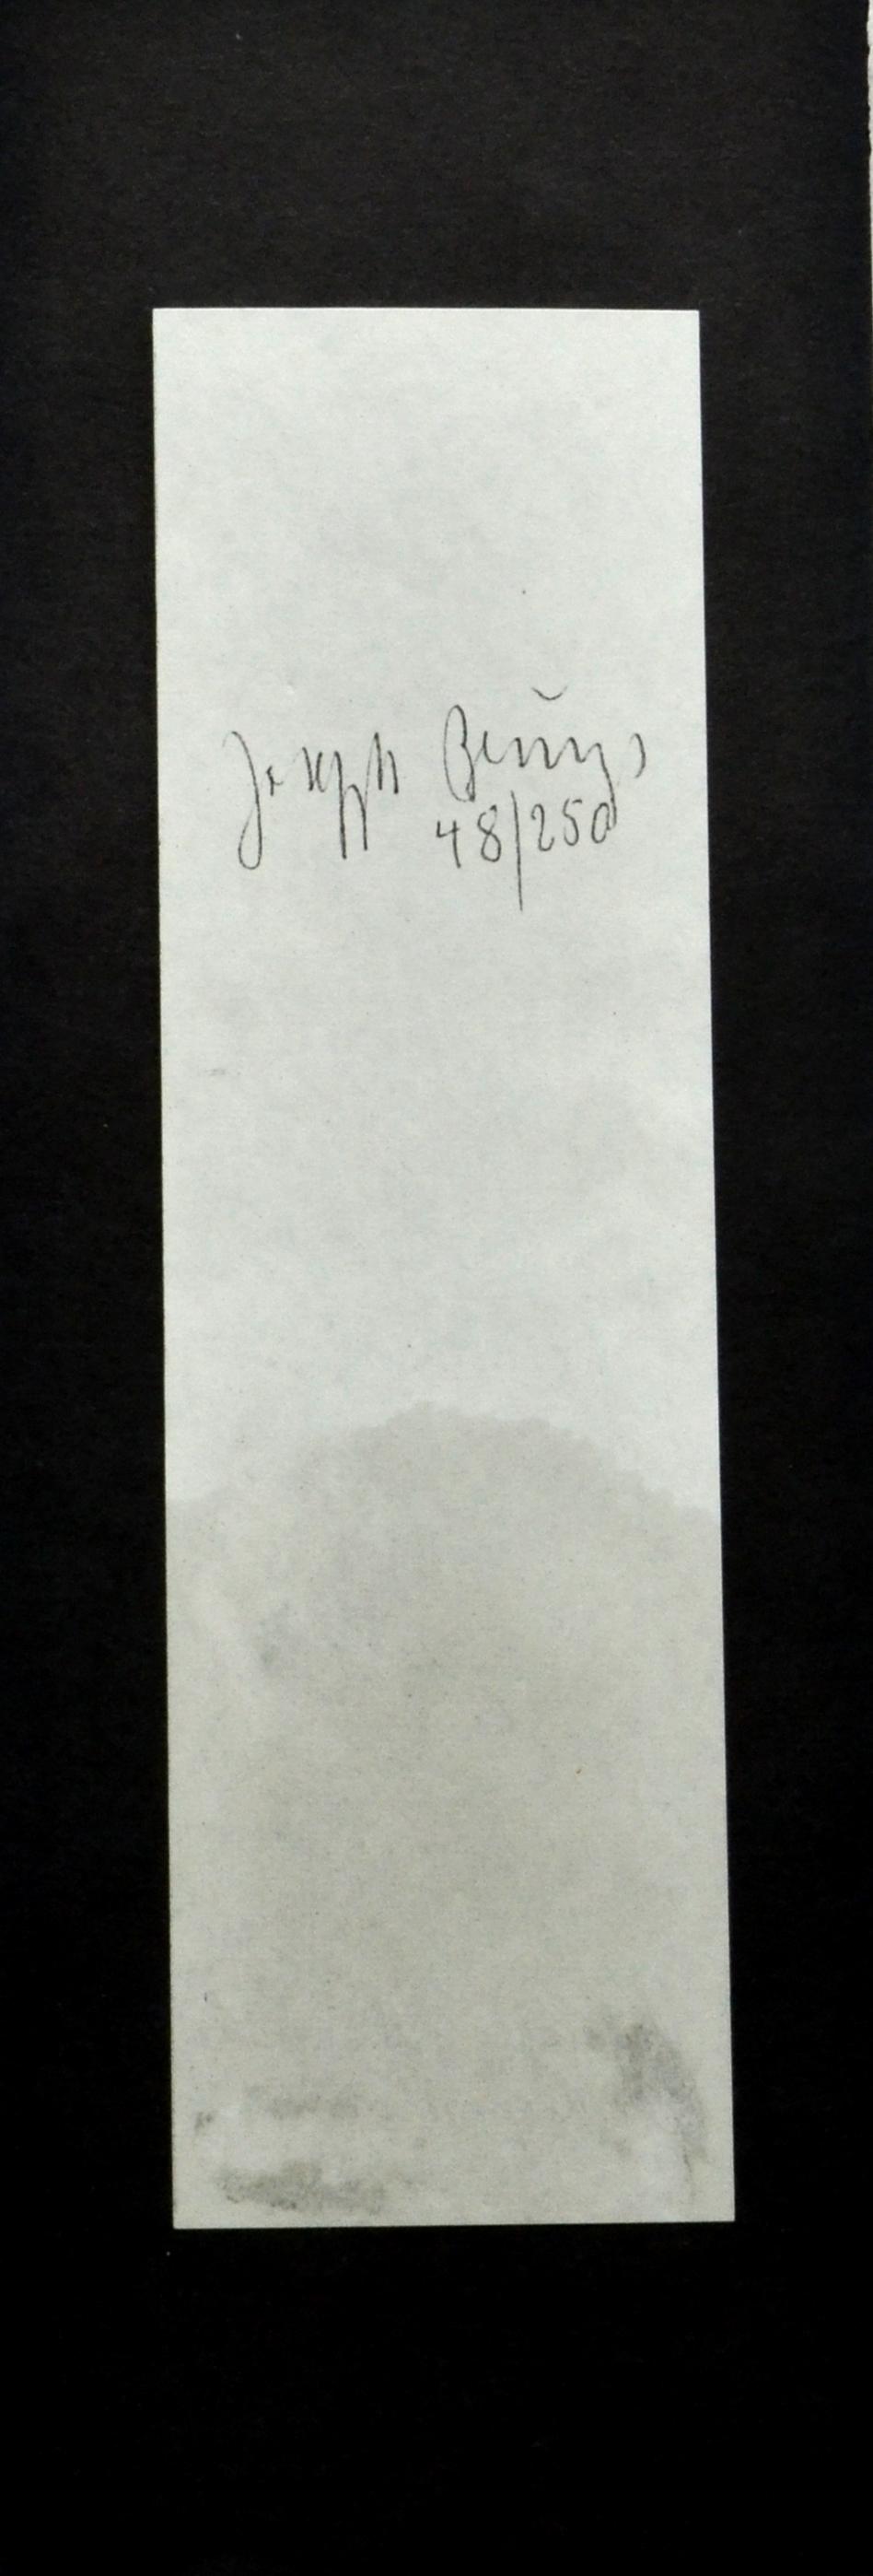 Joseph Beuys_Olivestone_carta assorbente stampata intinta nell'olio d'oliva 29,5x8,5_1984